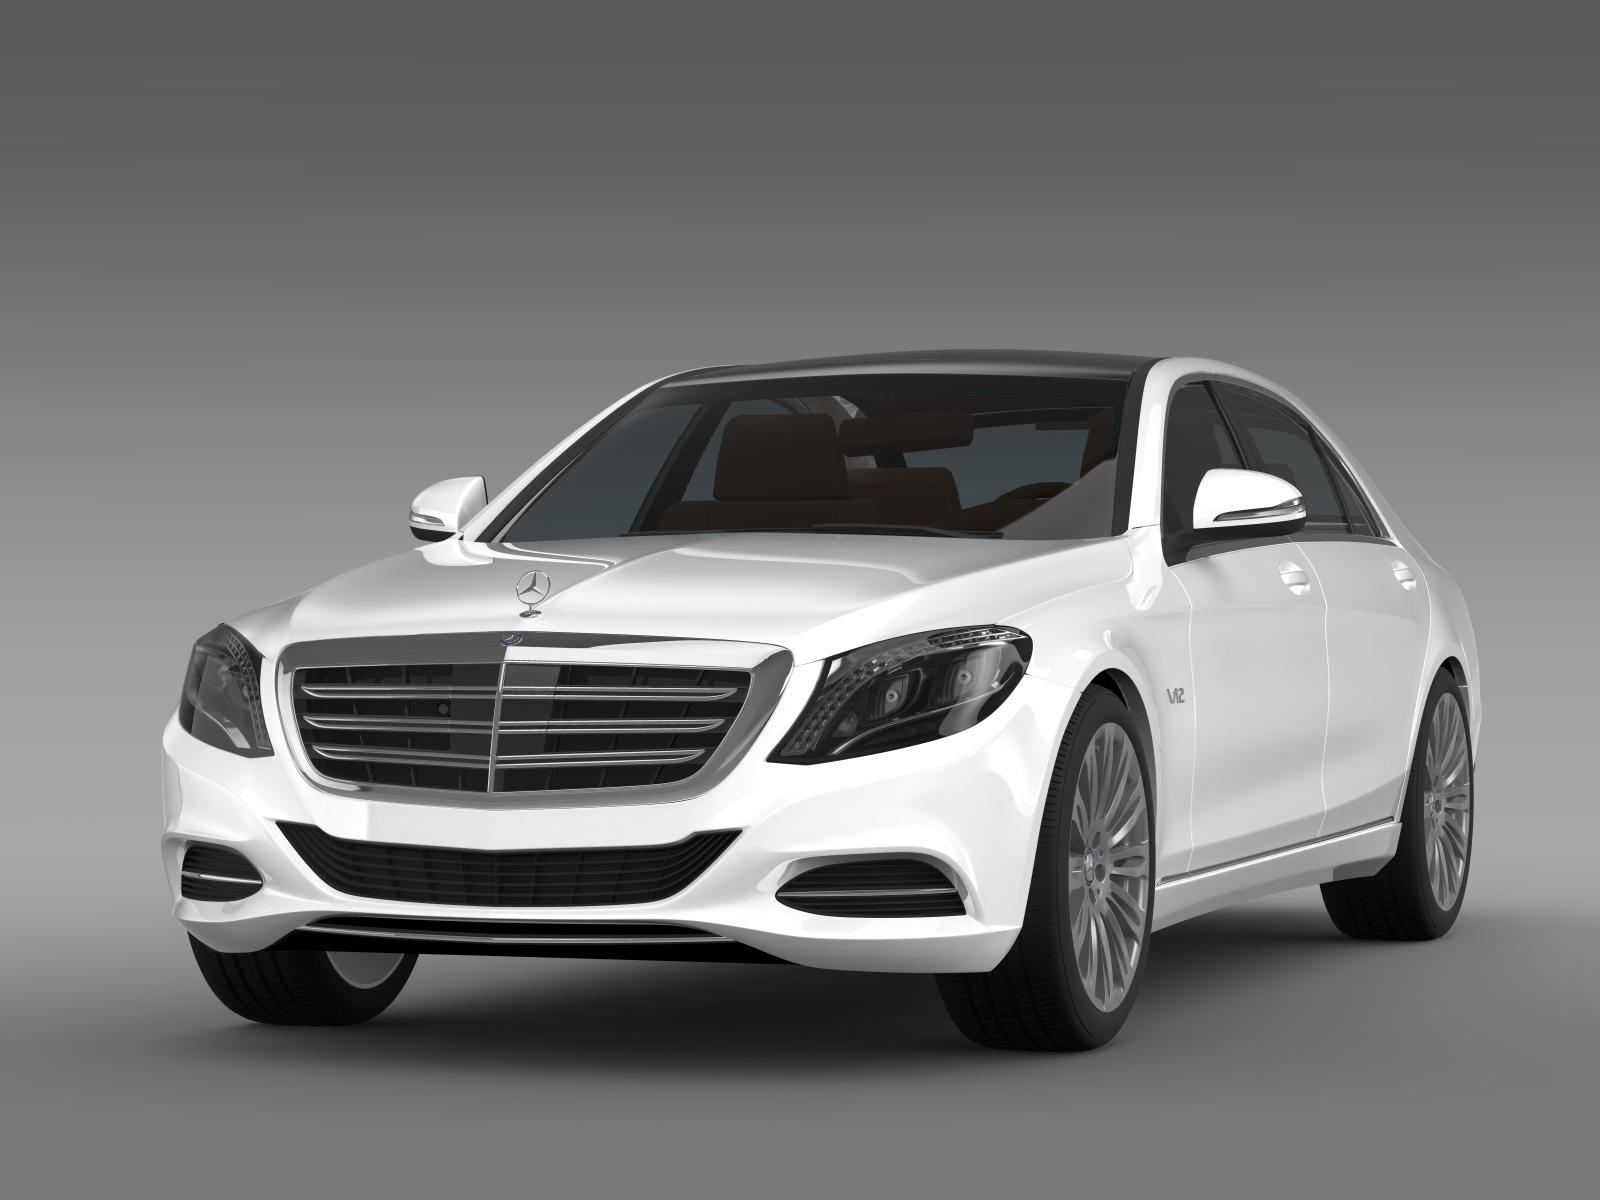 Mercedes benz s 600 v12 w222 2014 3d model for Mercedes benz 440